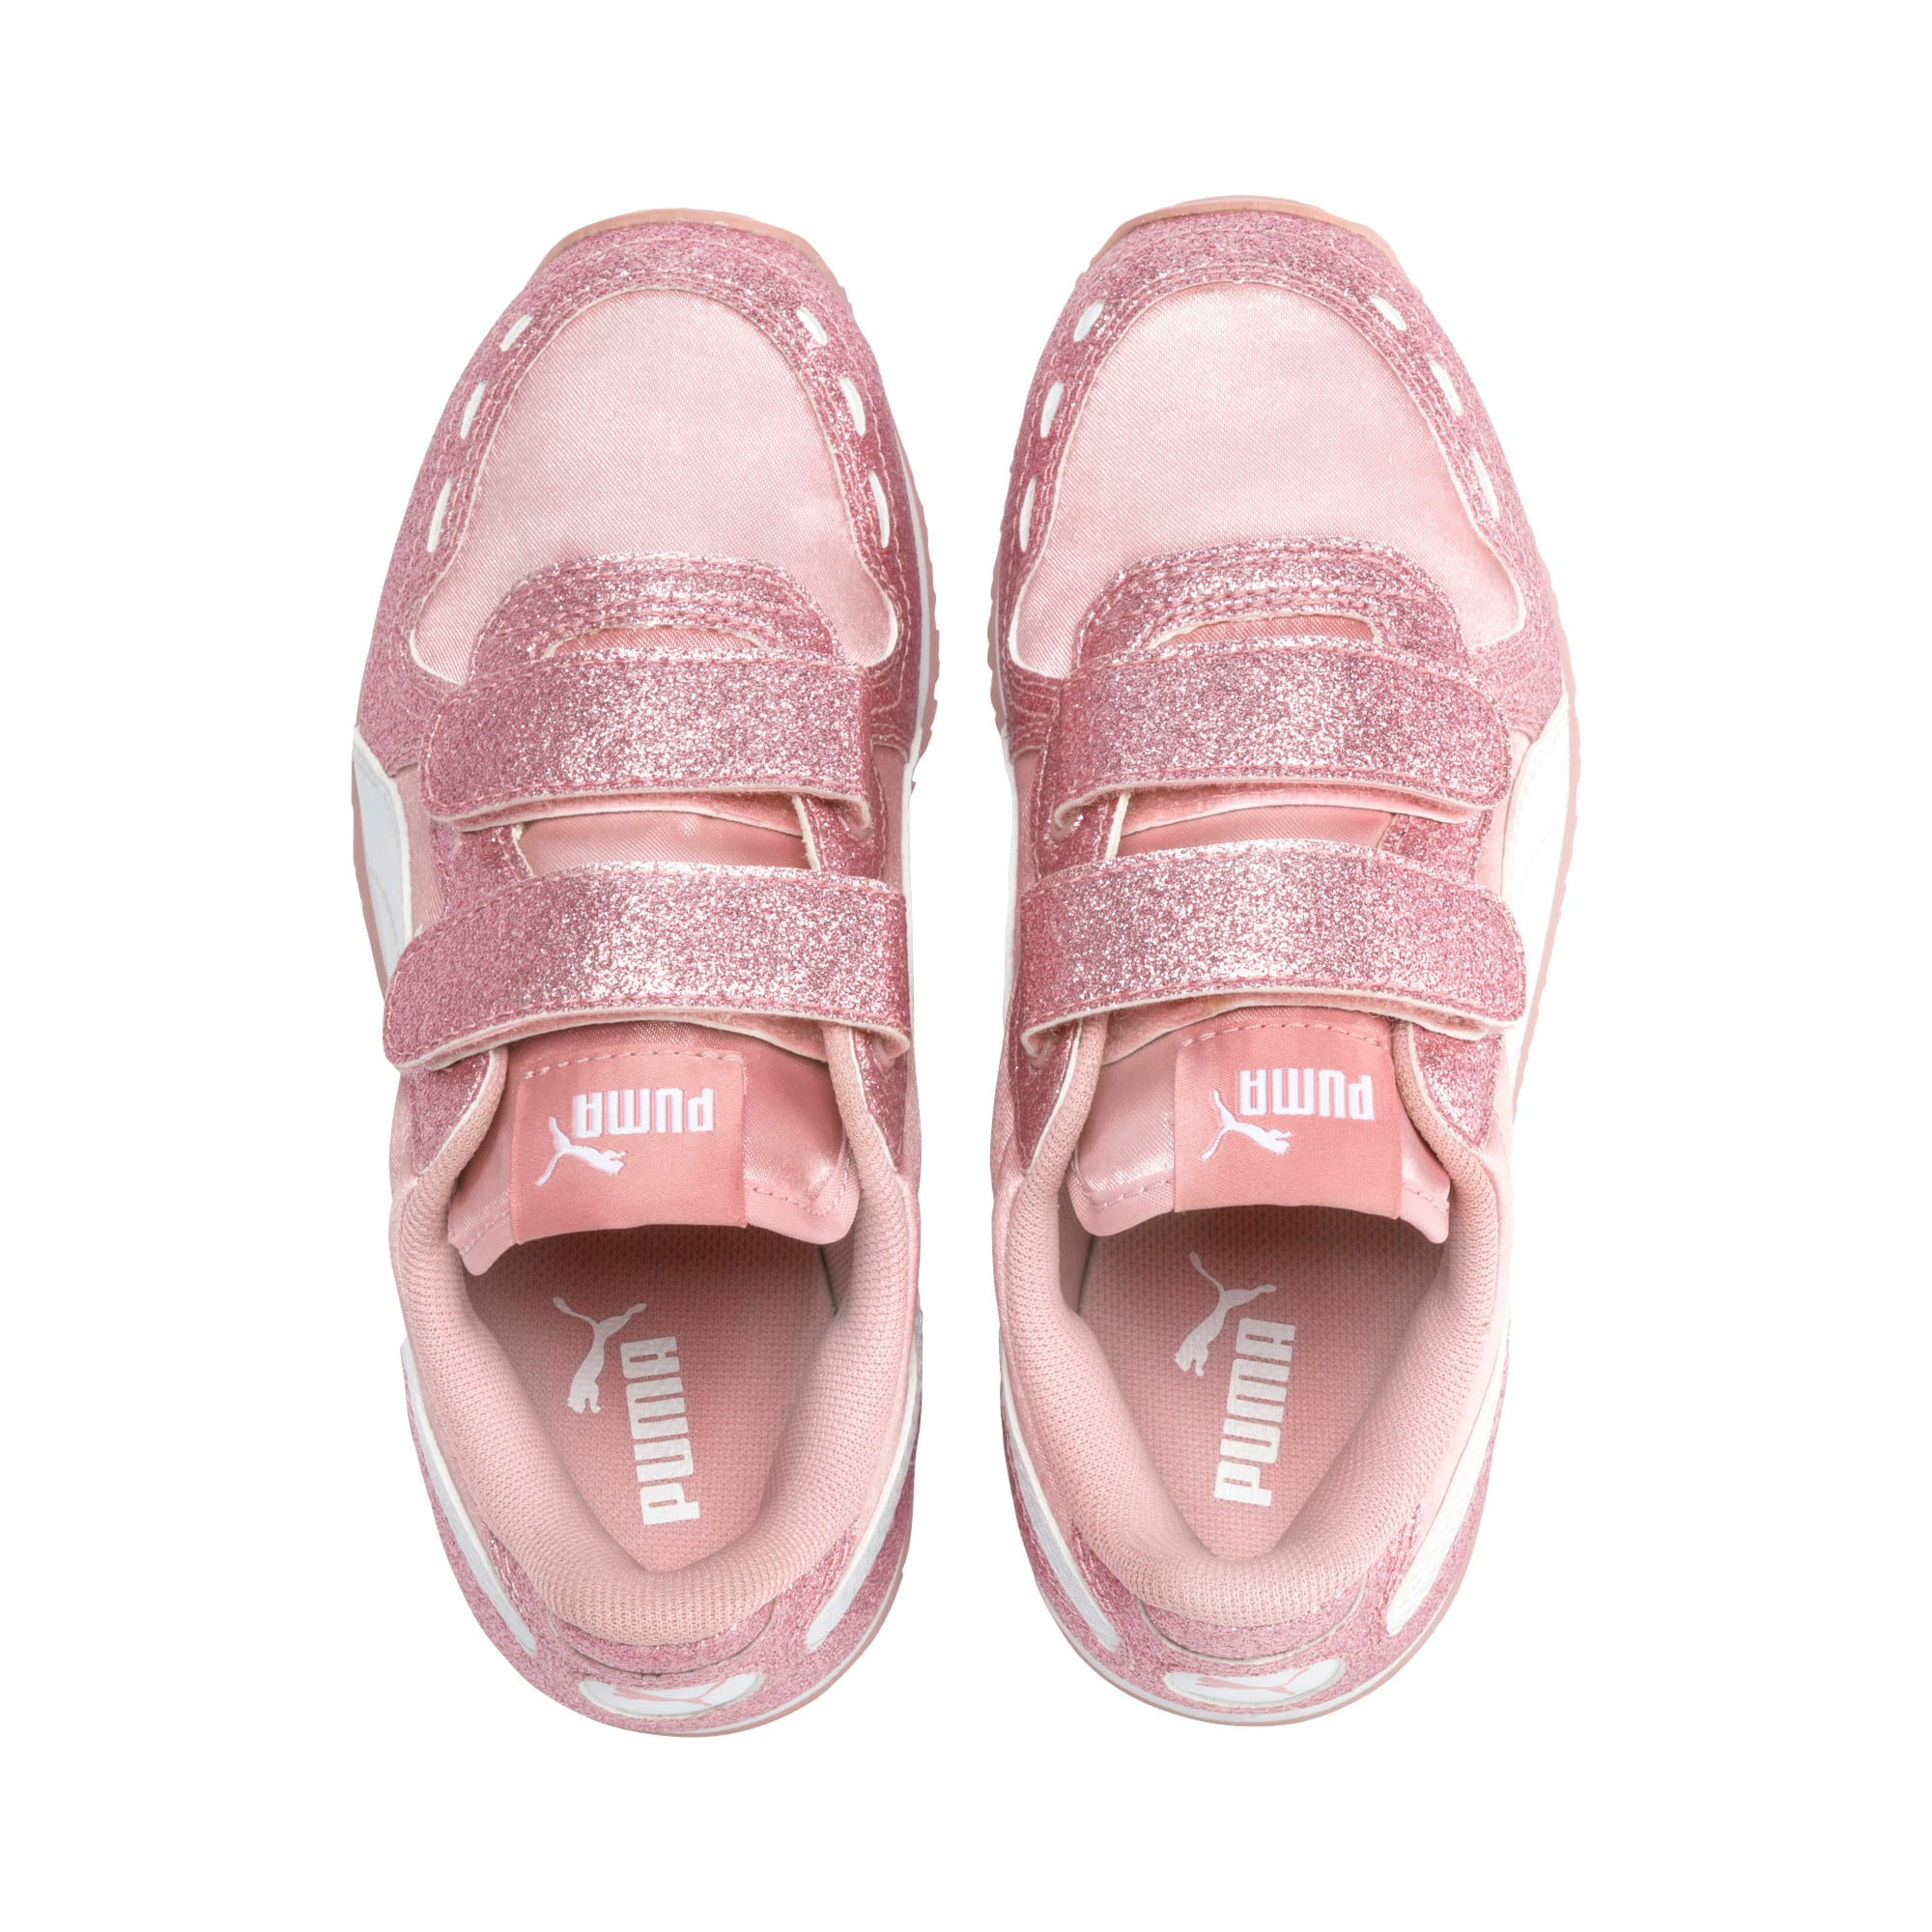 Thumbnail 6 of Cabana Racer Glitz AC Shoes PS, Bridal Rose-Puma White, medium